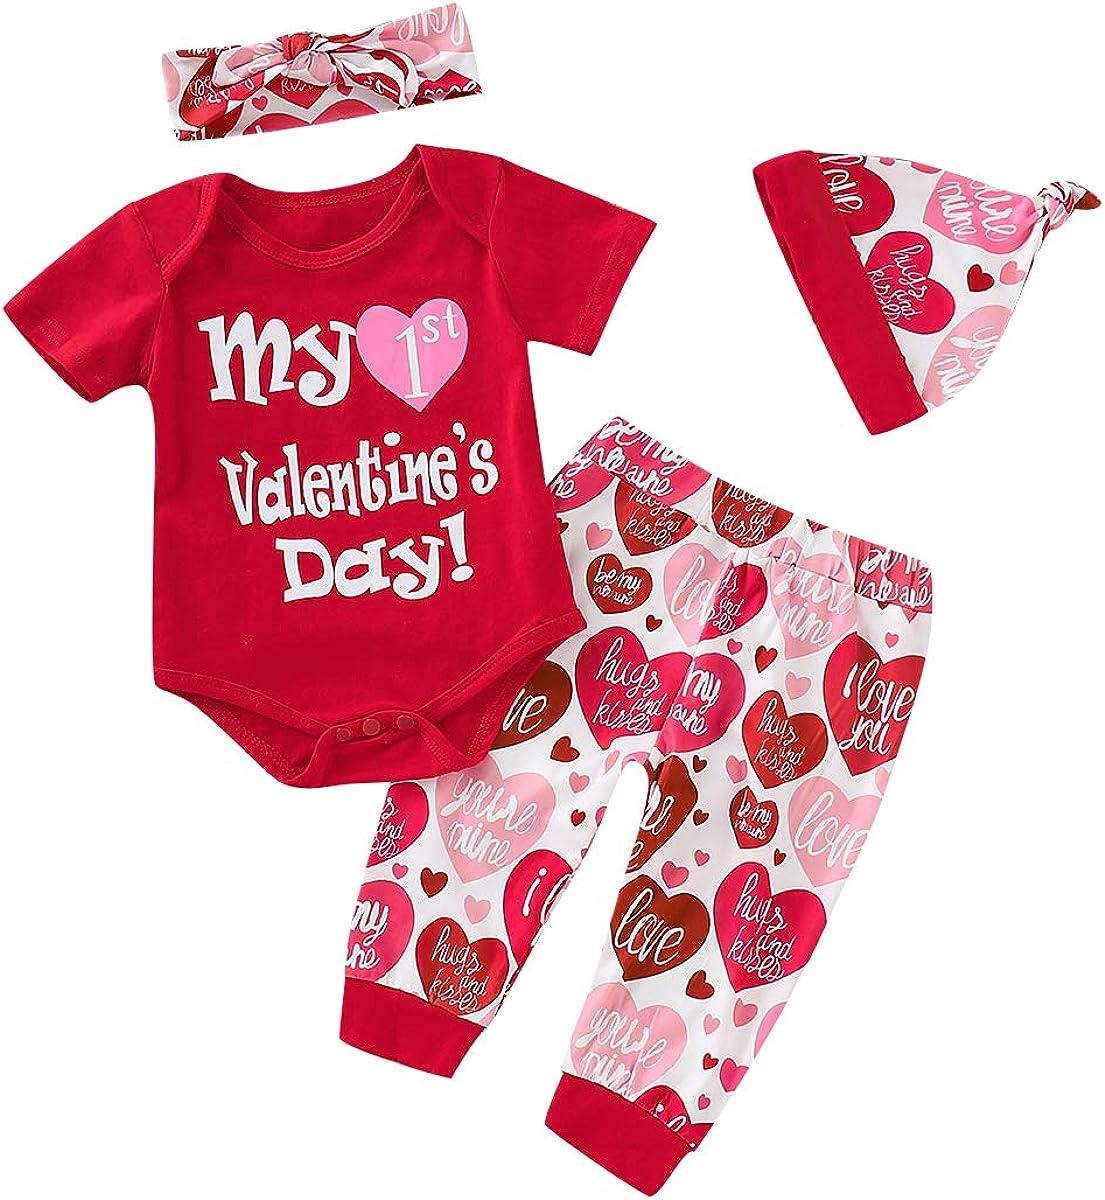 Valentines day 1st birthday outfit,Valentines Shirt,baby valentine outfit,baby girl valentine,valentine rag tutu set,1st Birthday,Rag tutu